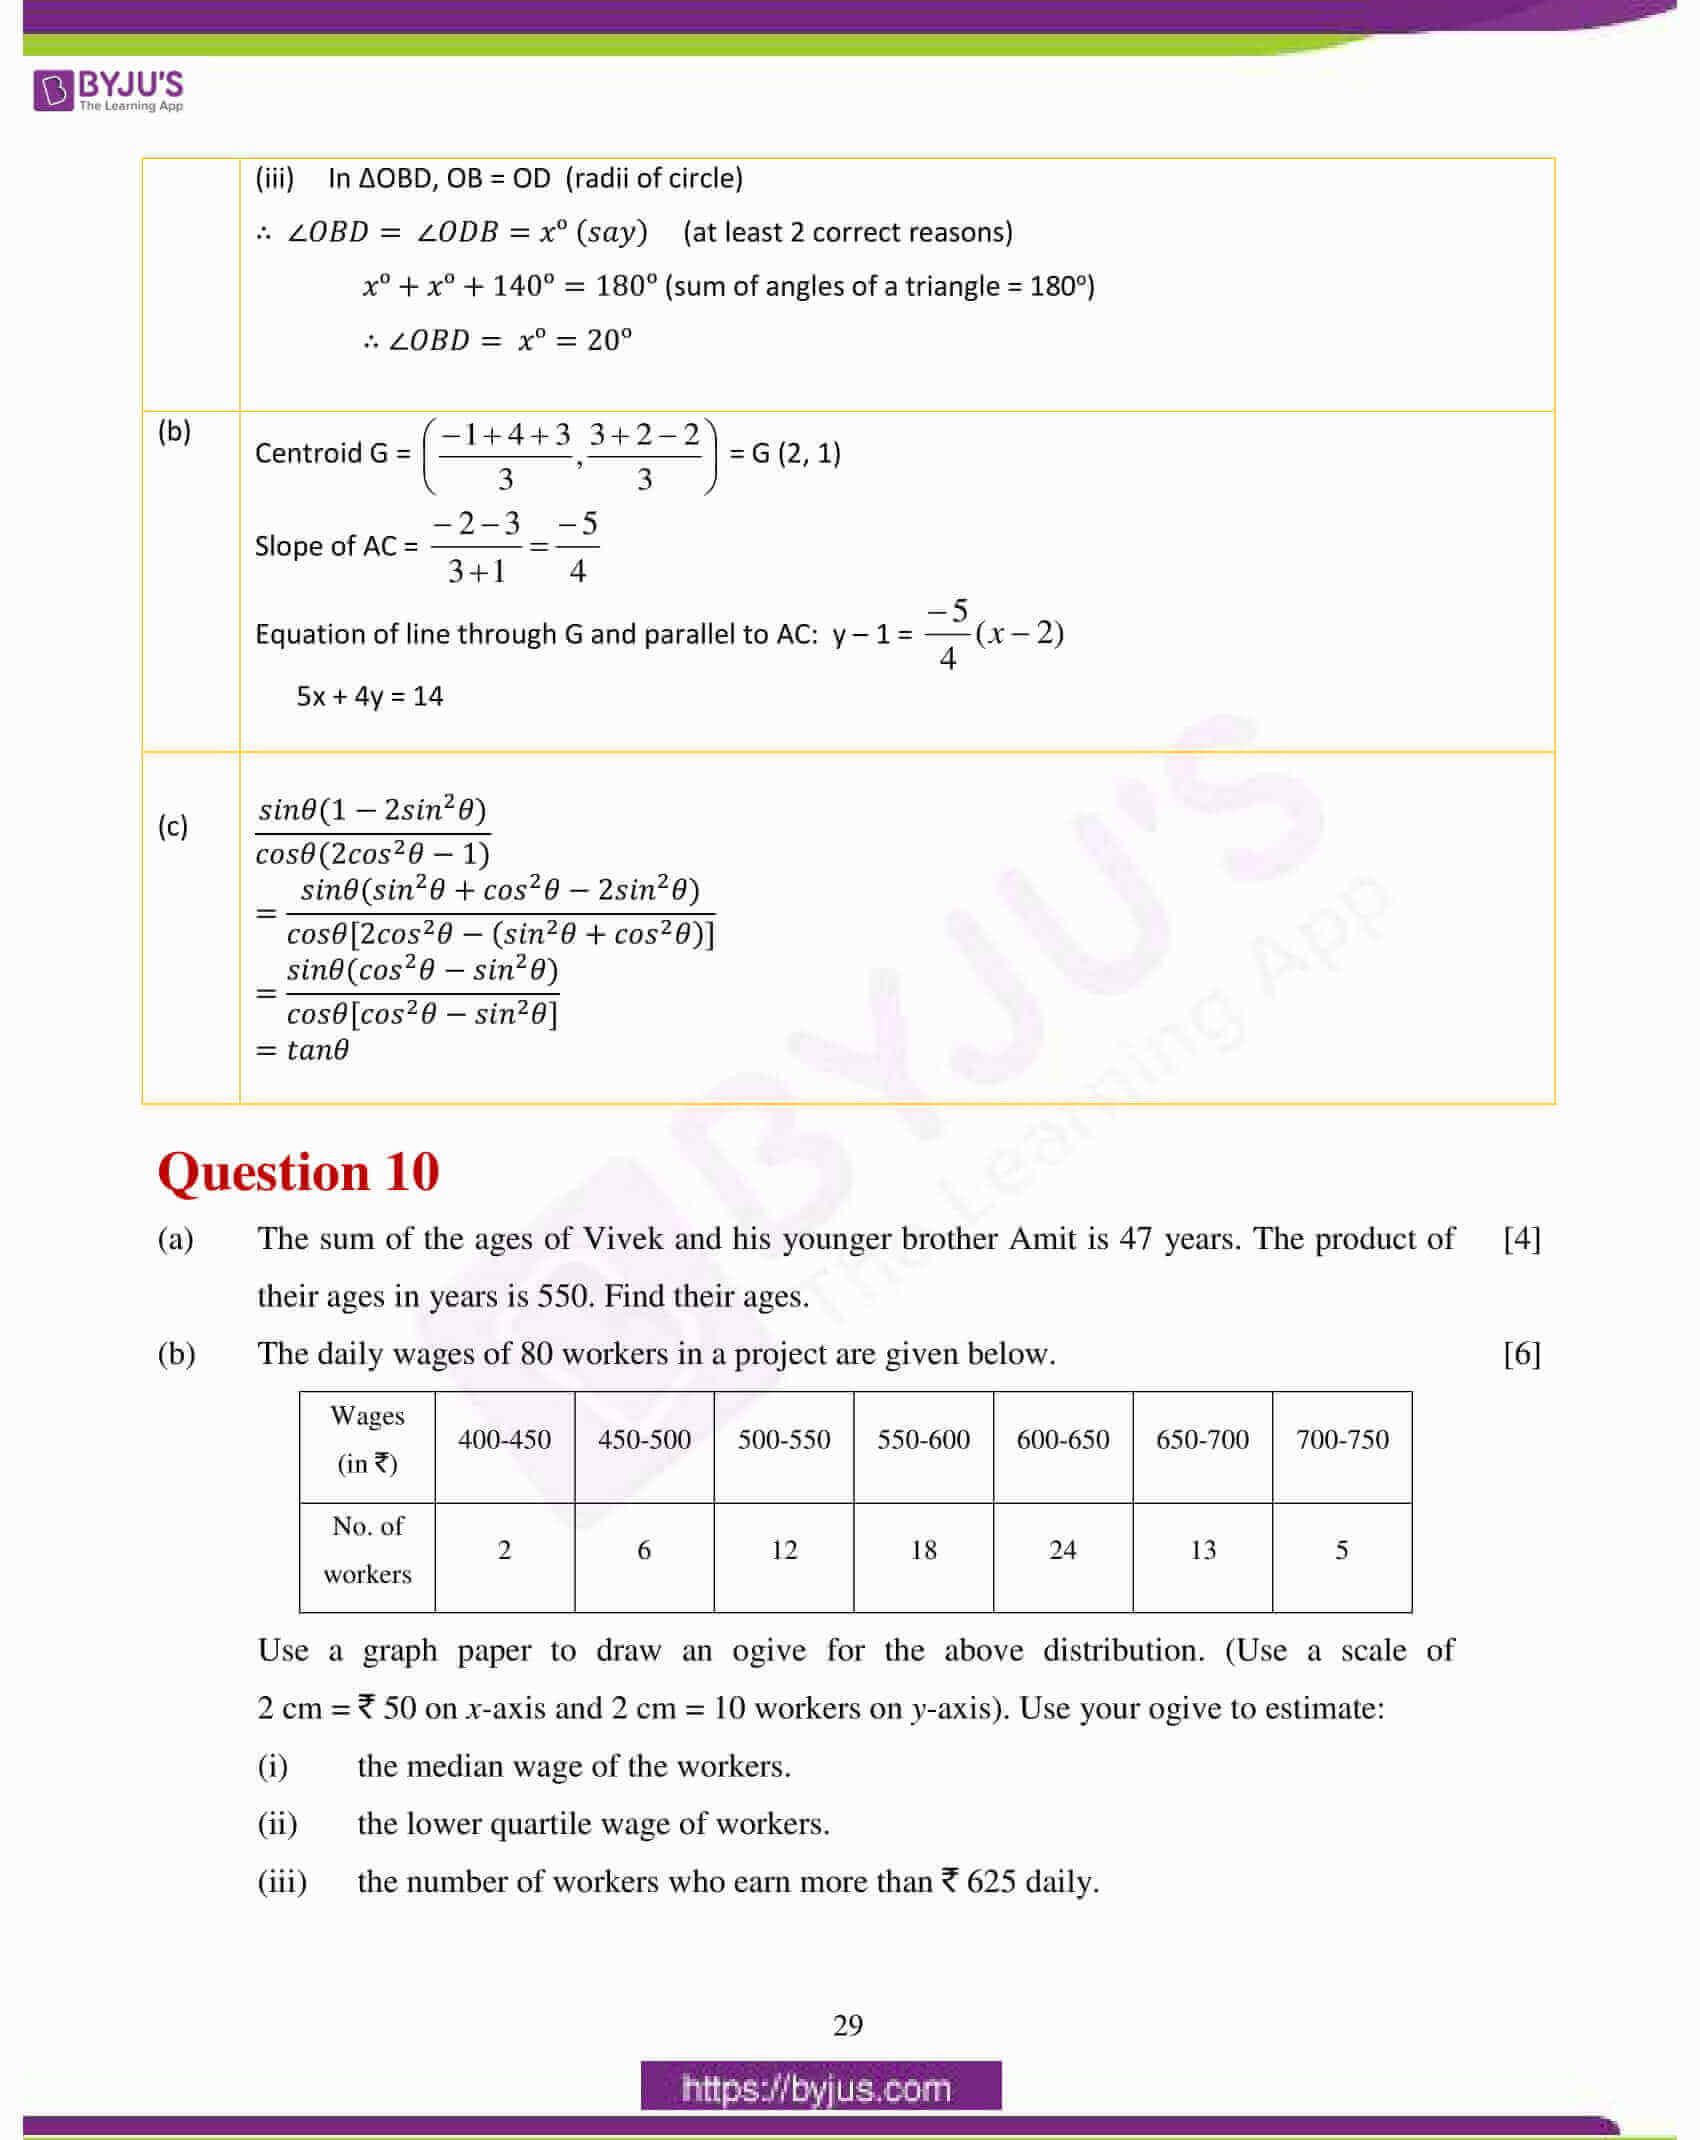 icse class 10 maths question paper solution 2017 20